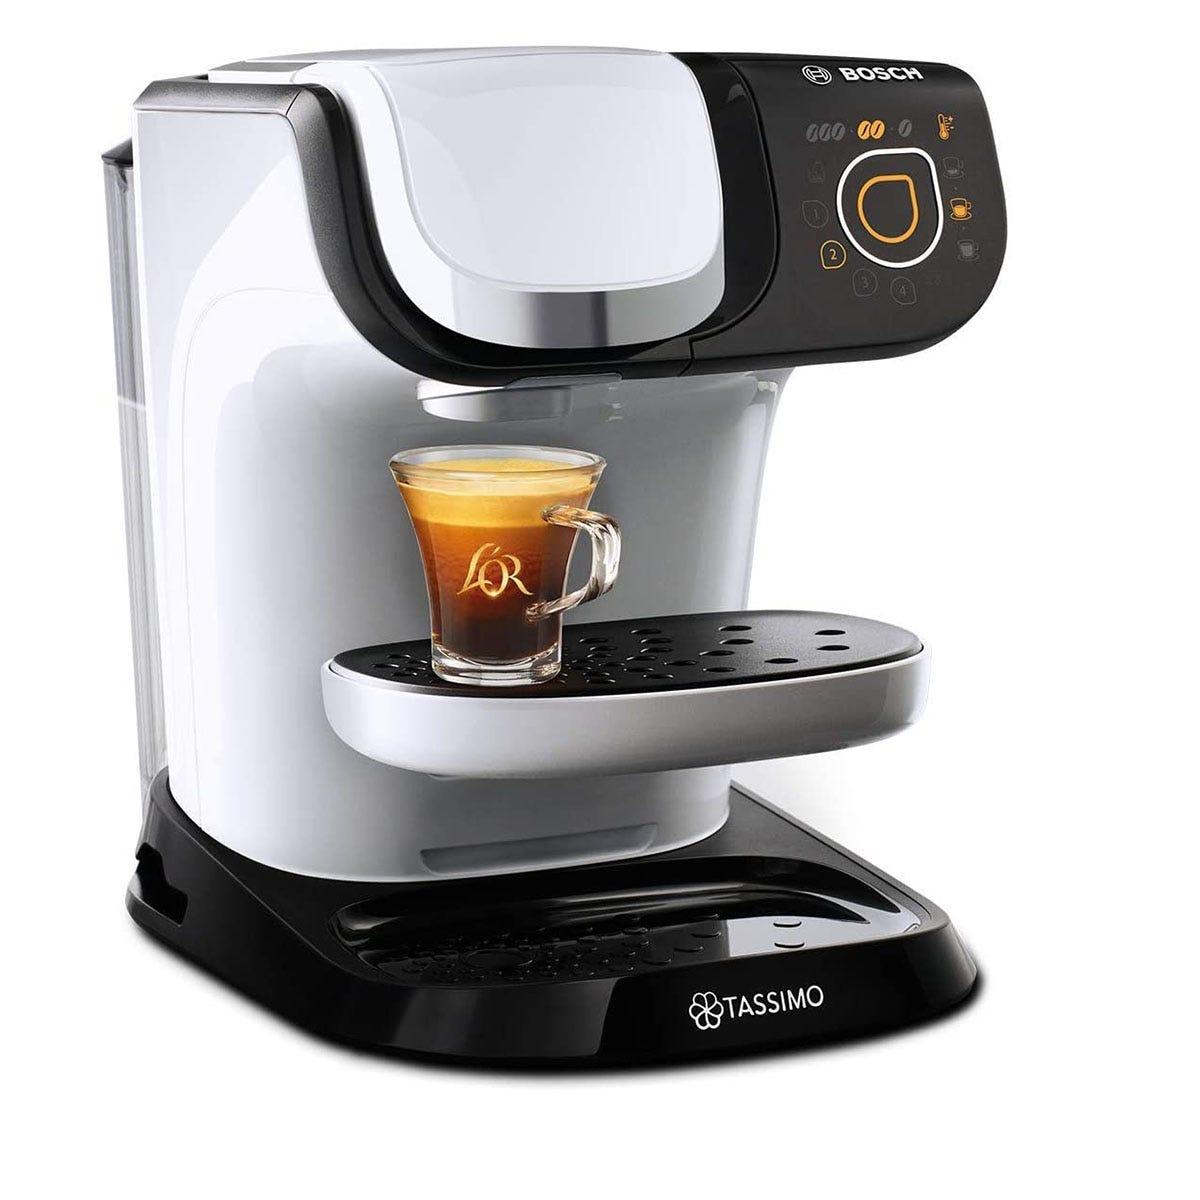 Tassimo by Bosch TAS6504GB My Way 2 Pod Coffee Machine - White